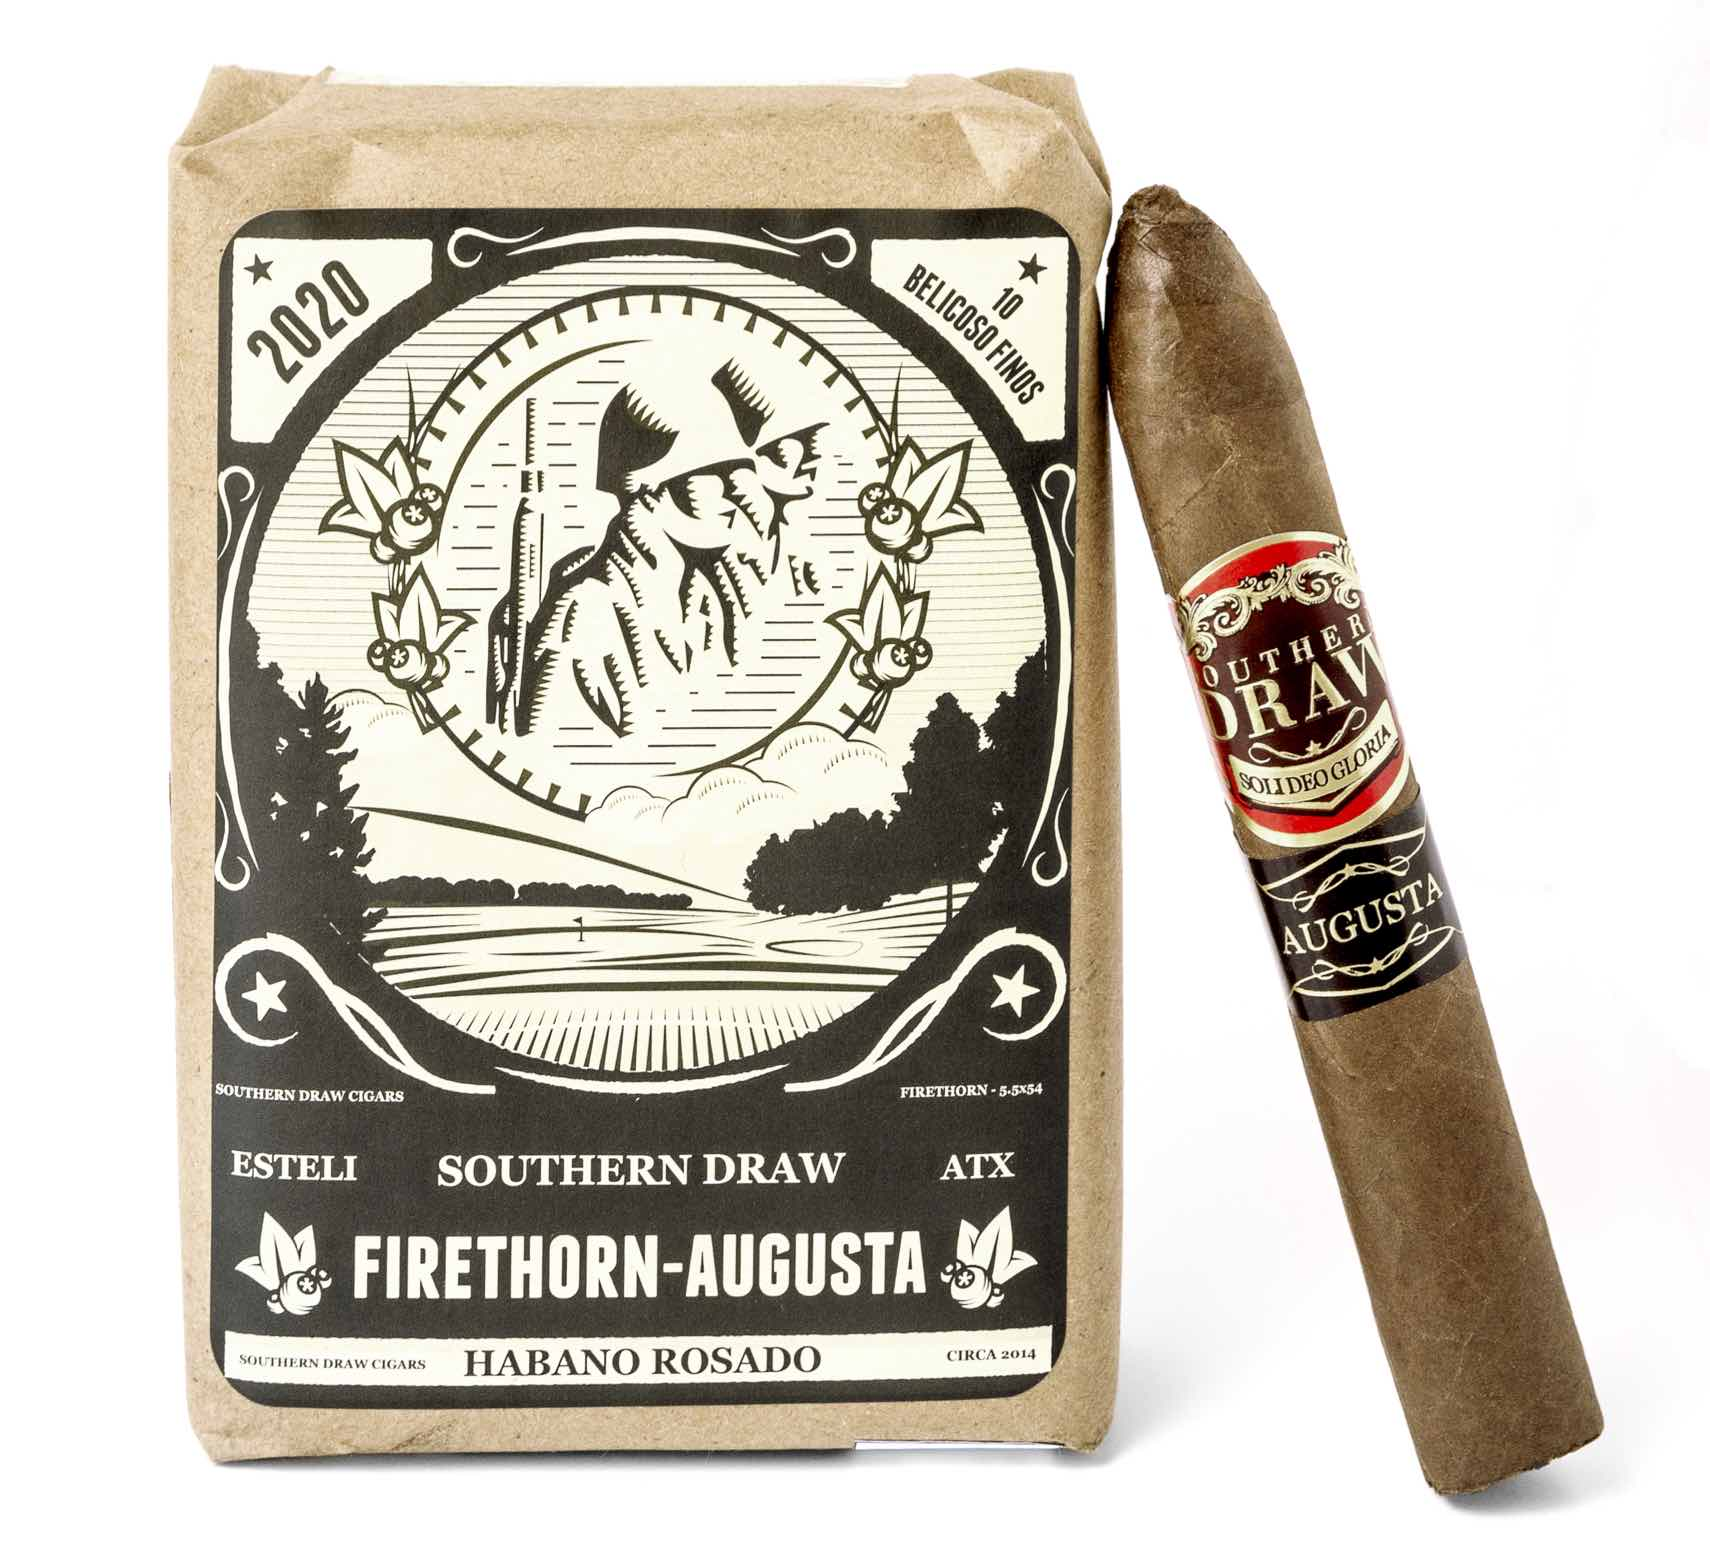 Cigar News: Southern Draw Cigars Announces Firethorn Augusta